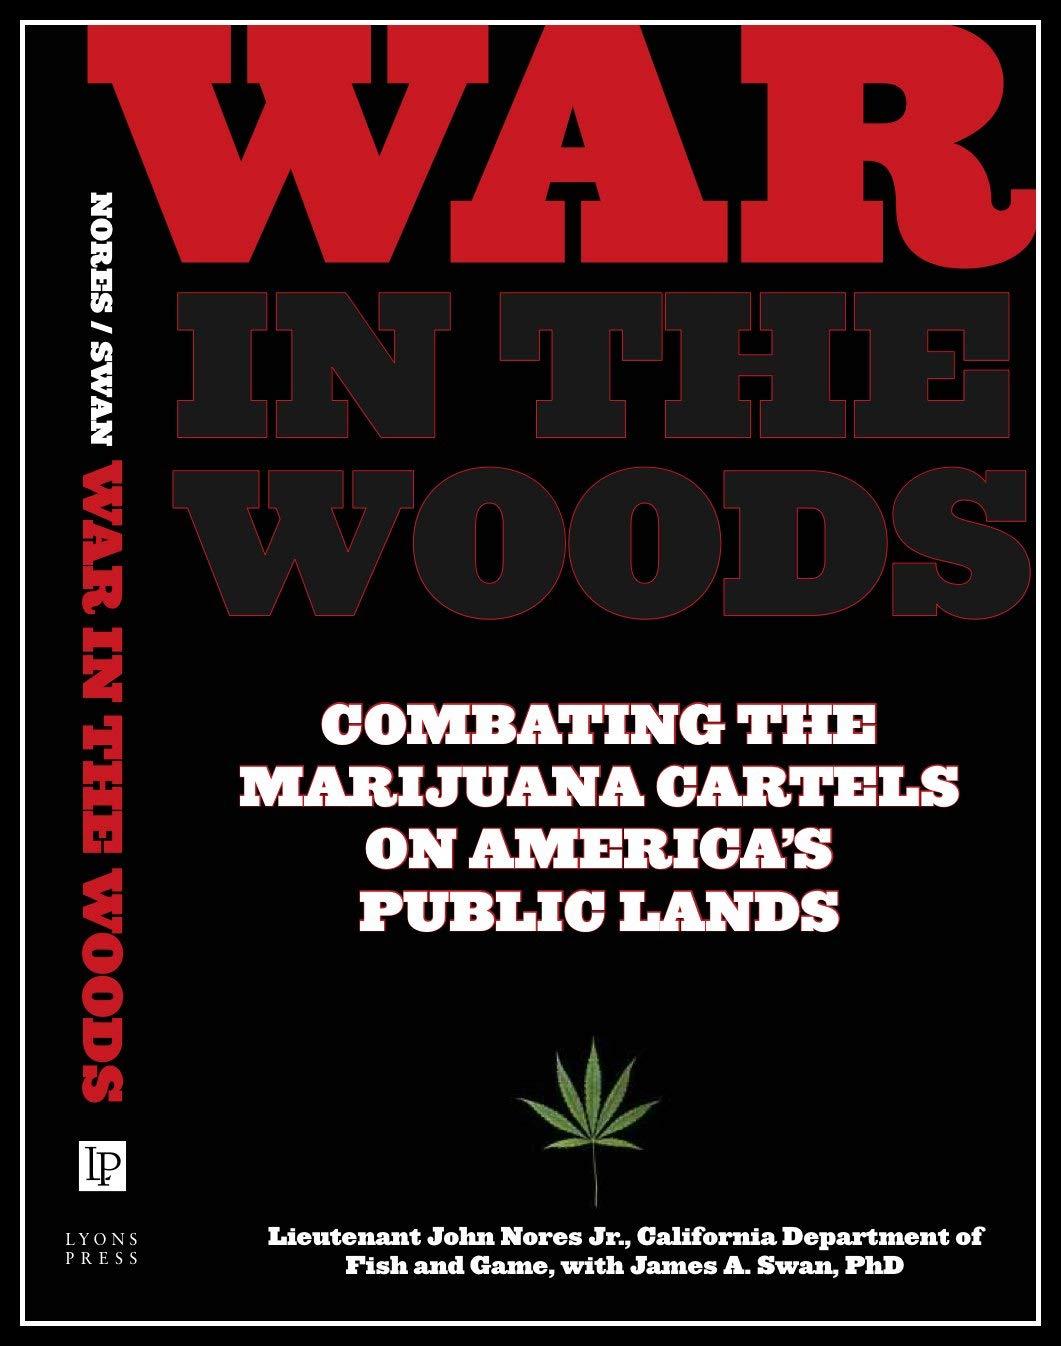 War in the Woods - Combating the Marijuana Cartels on ...